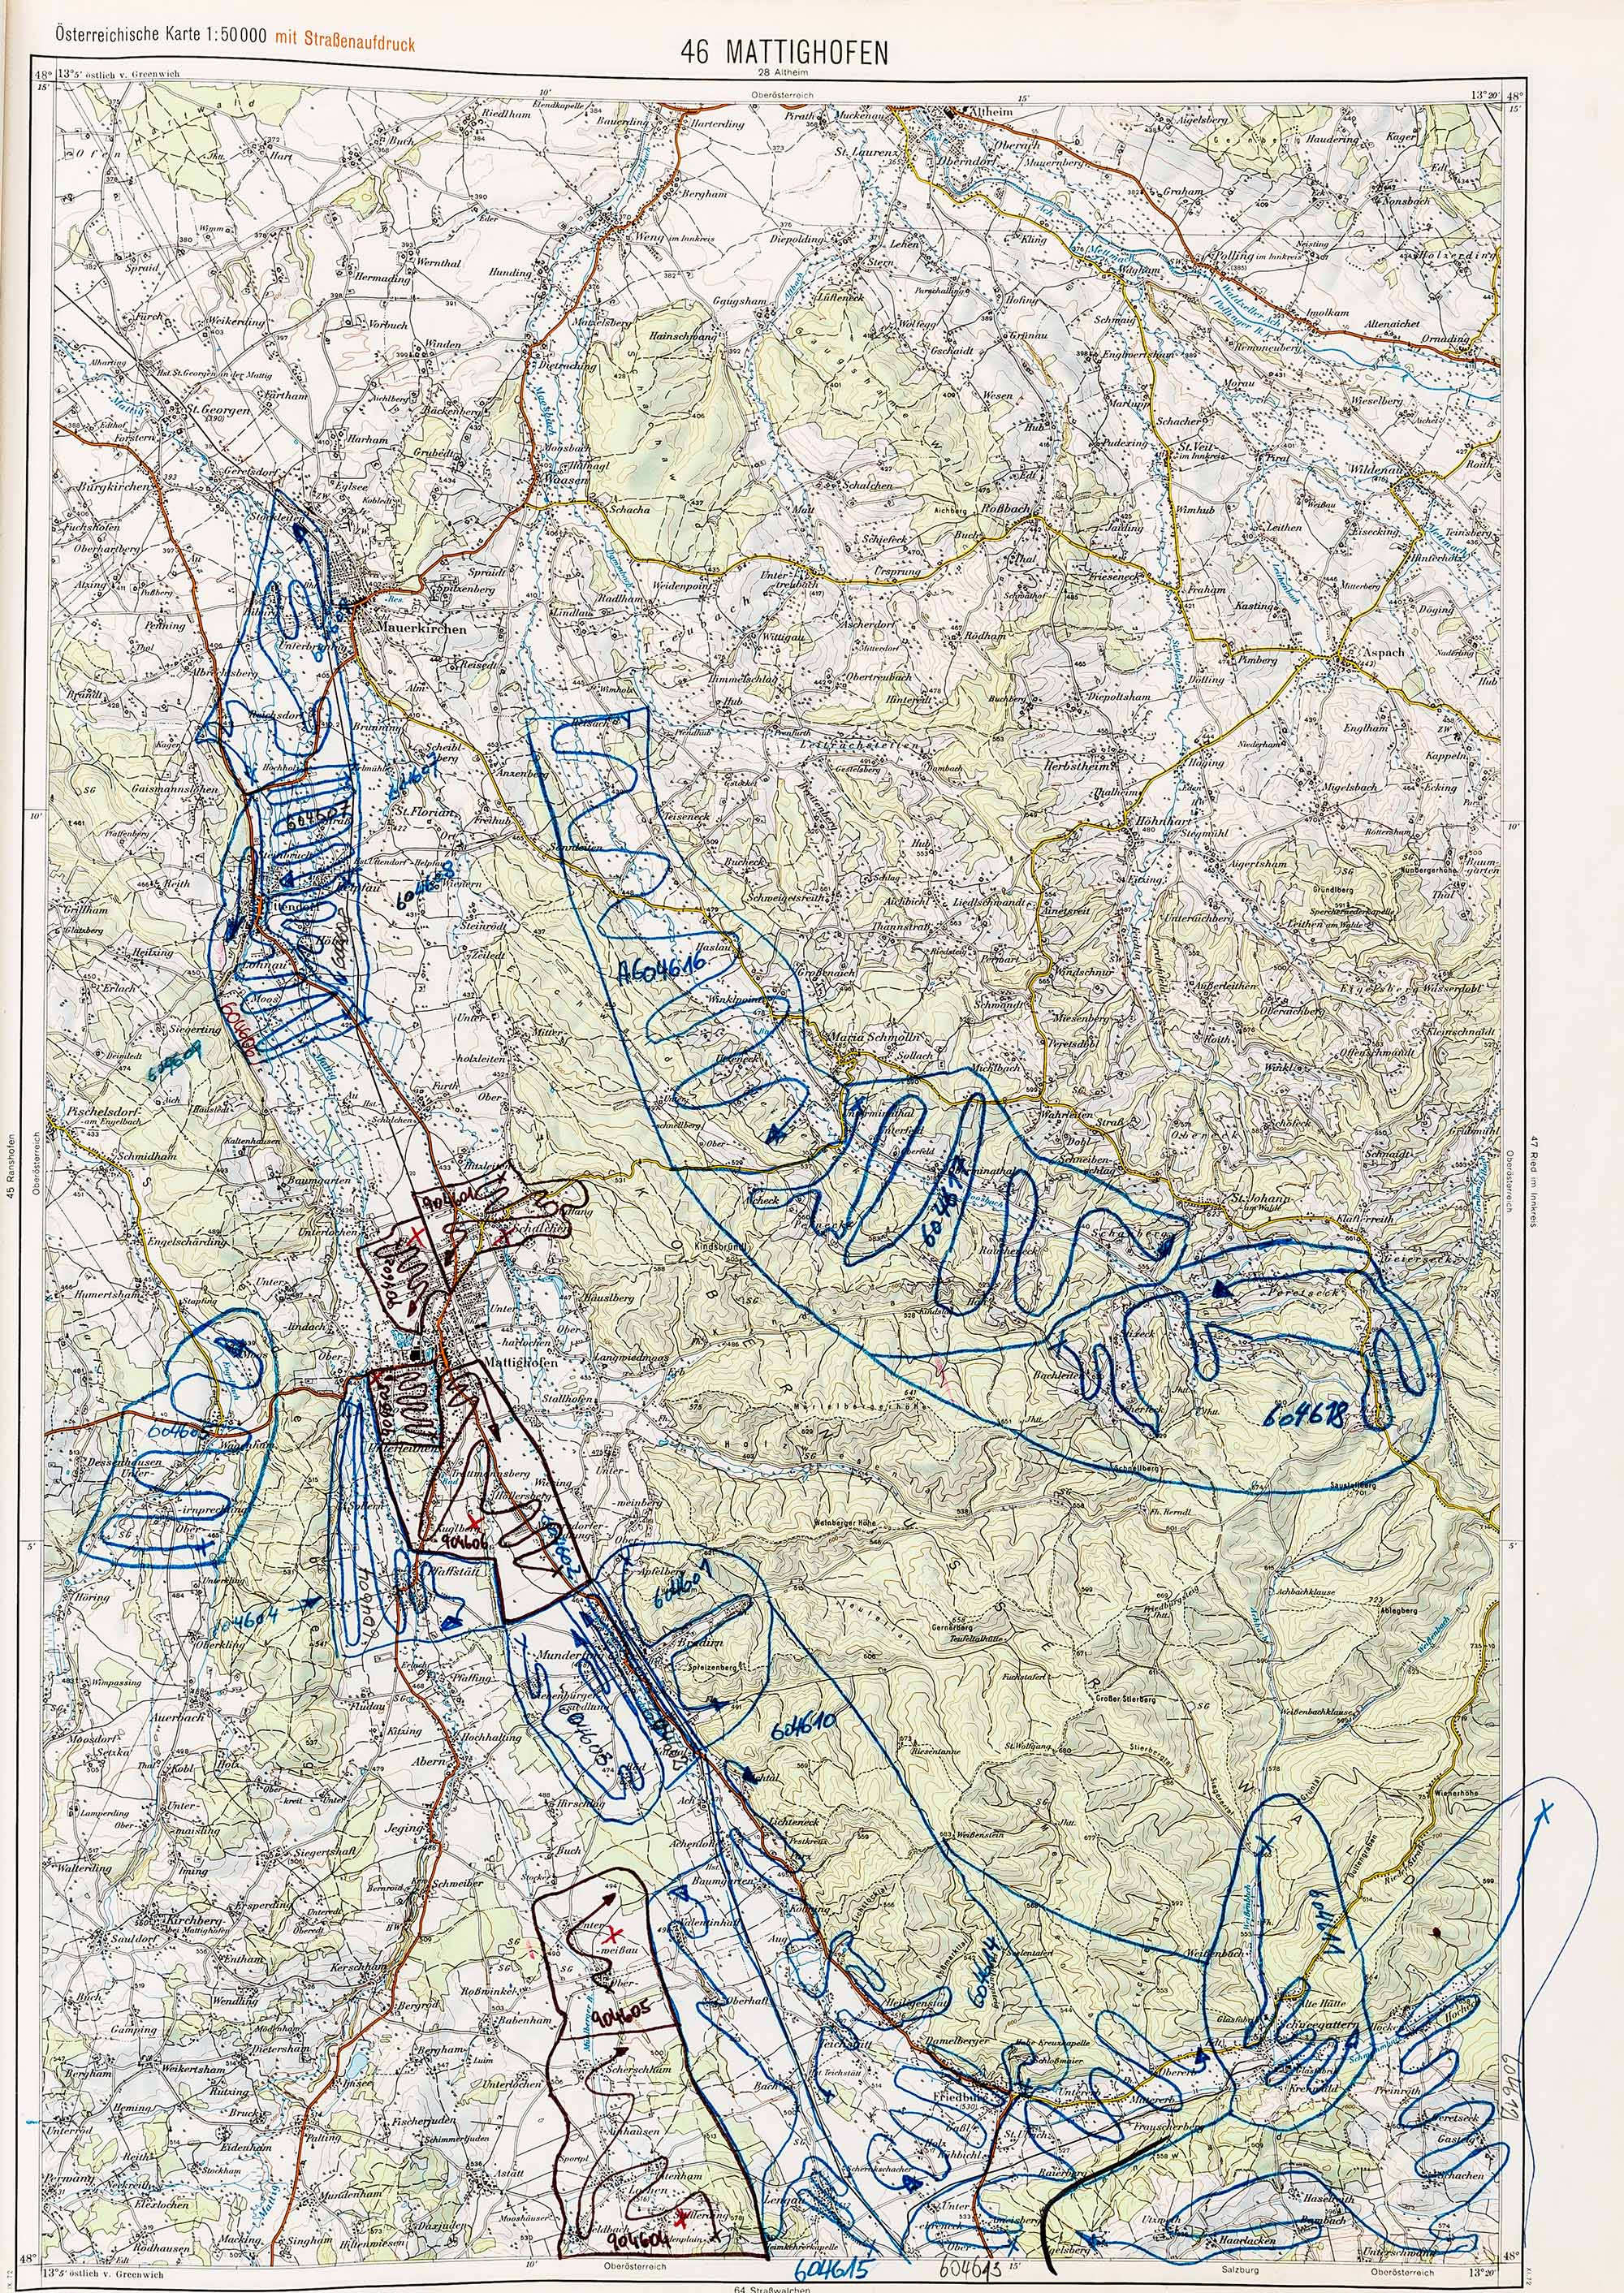 1975-1979 Karte 046